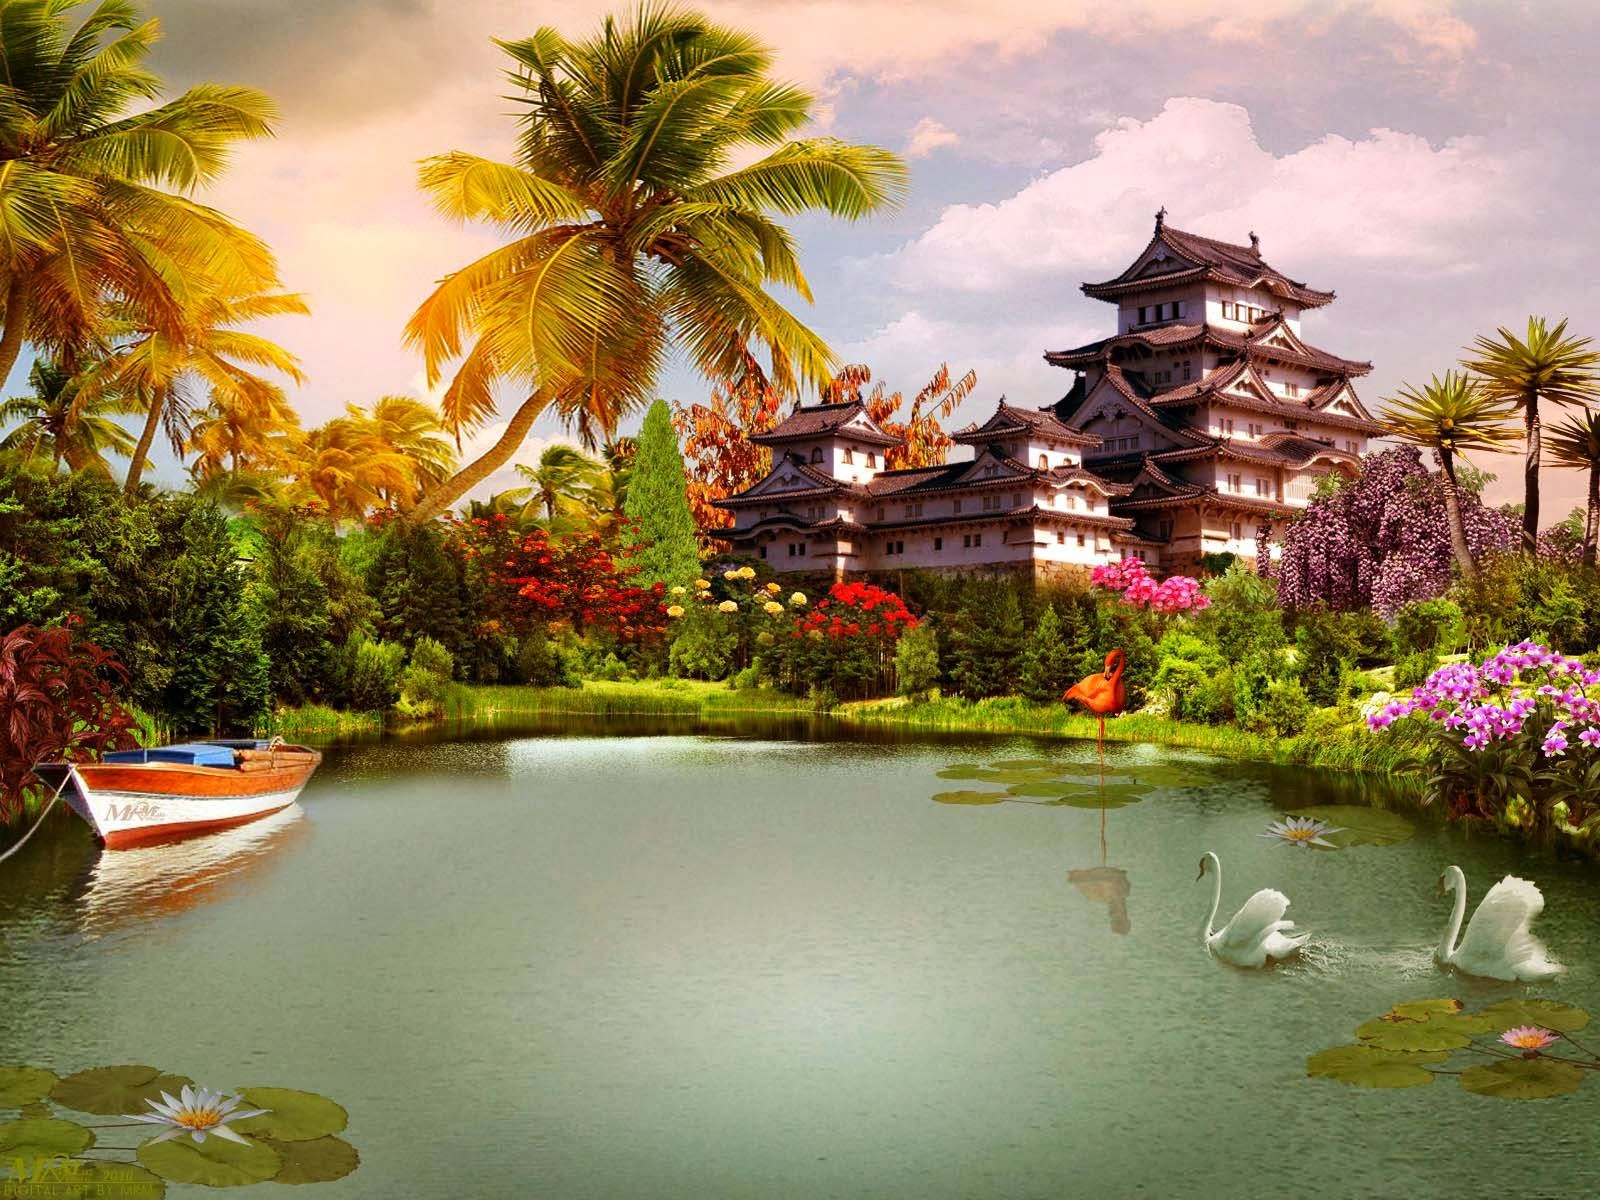 Beautiful Scenery HD WallpapersDownload Beautiful Scenery Pictures 1600x1200